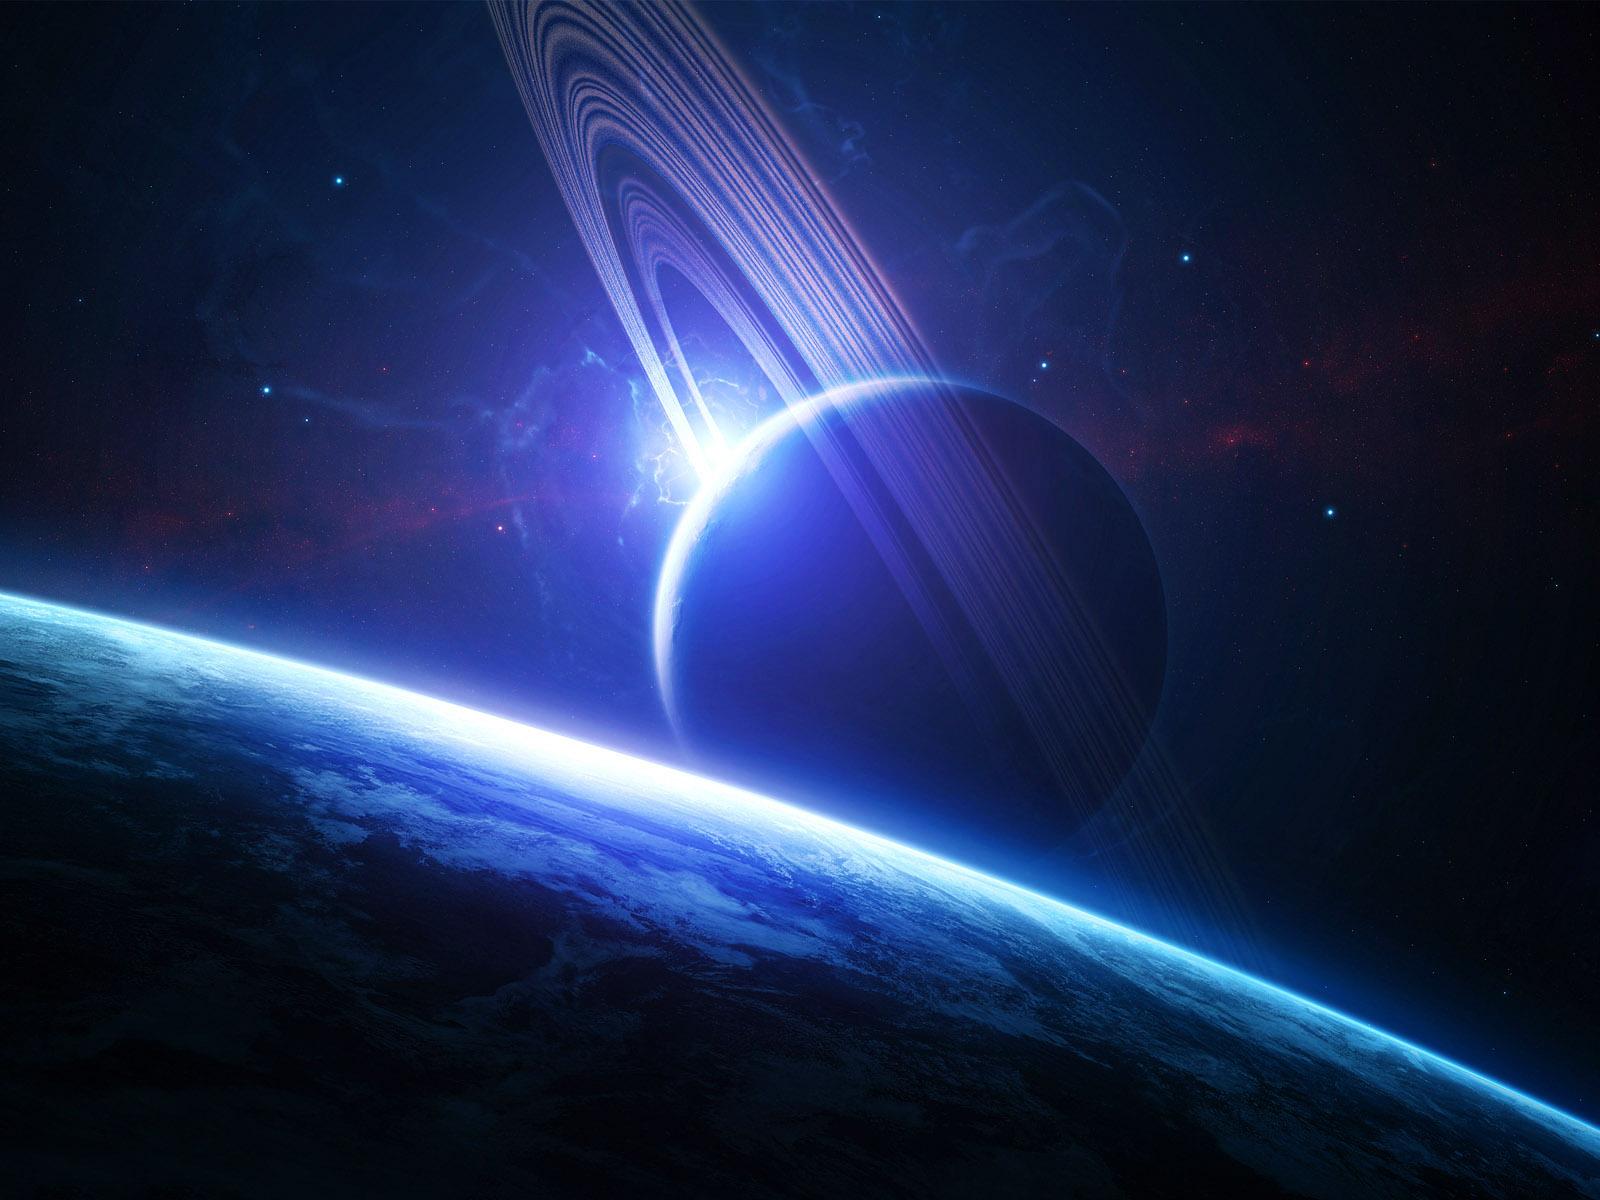 Digital Universe 143   Space Photography Desktop Wallpapers 6310 1600x1200